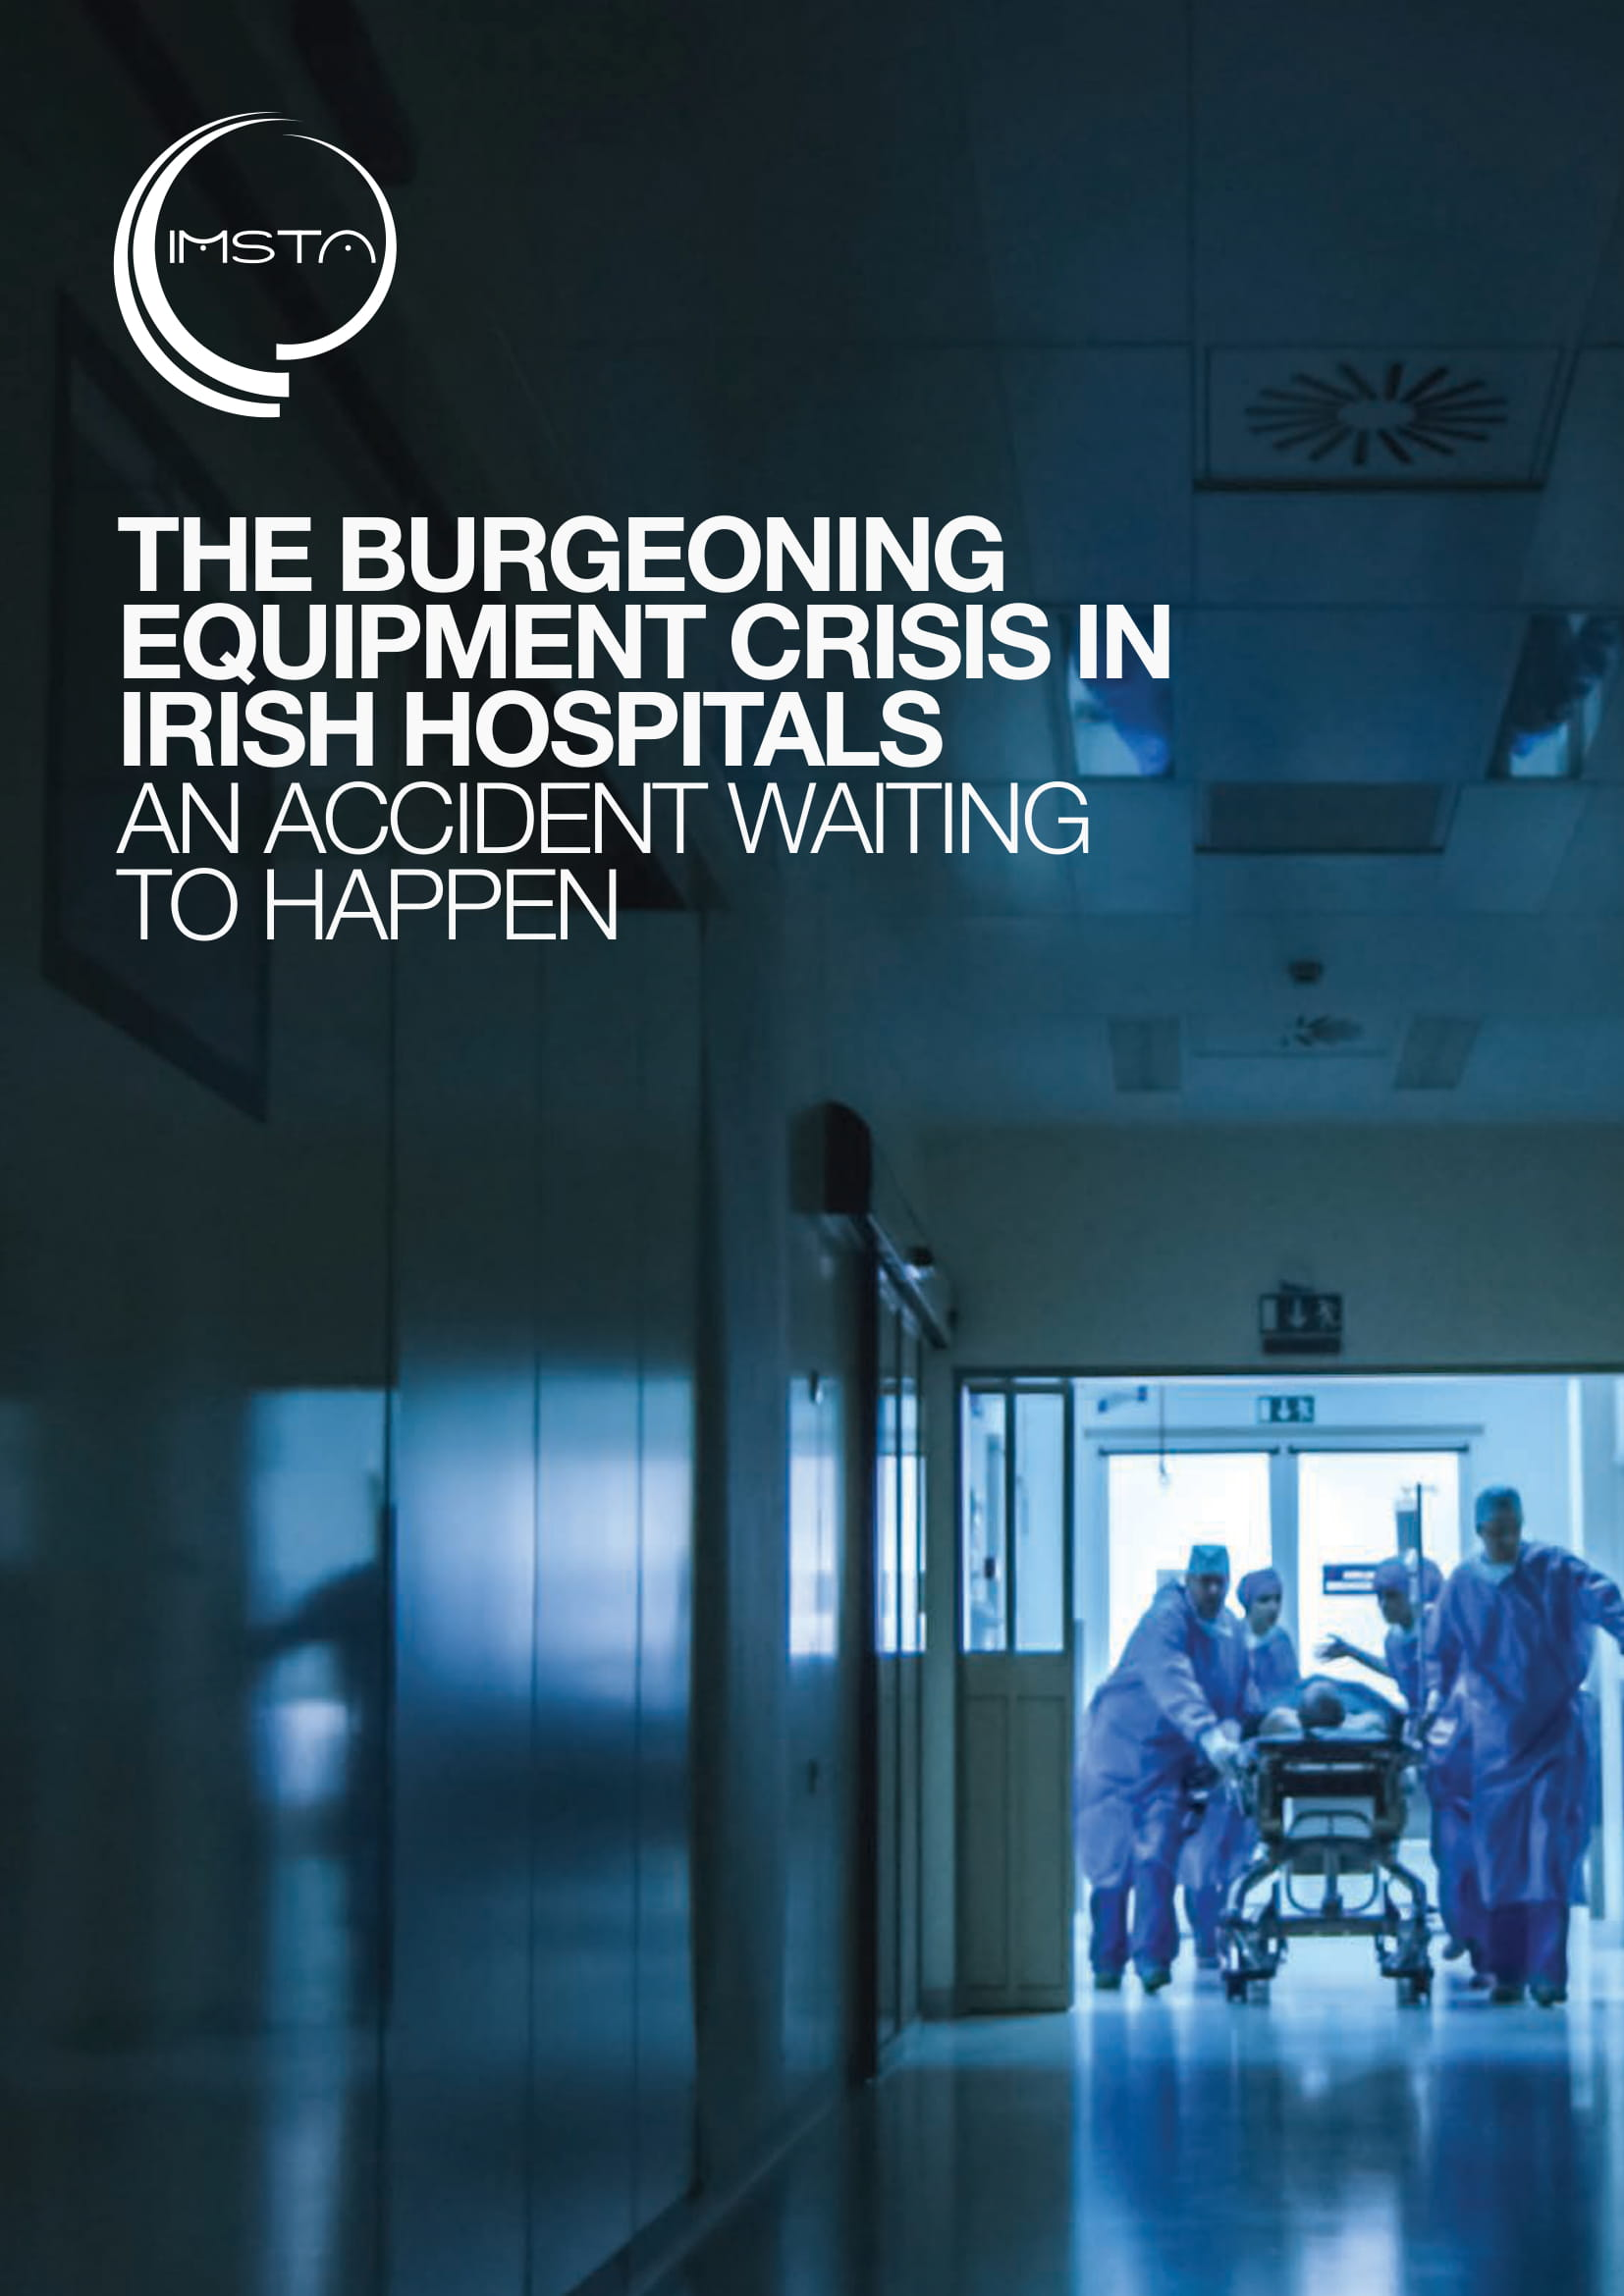 The Burgeoning Equipment Crisis in Irish Hospitals